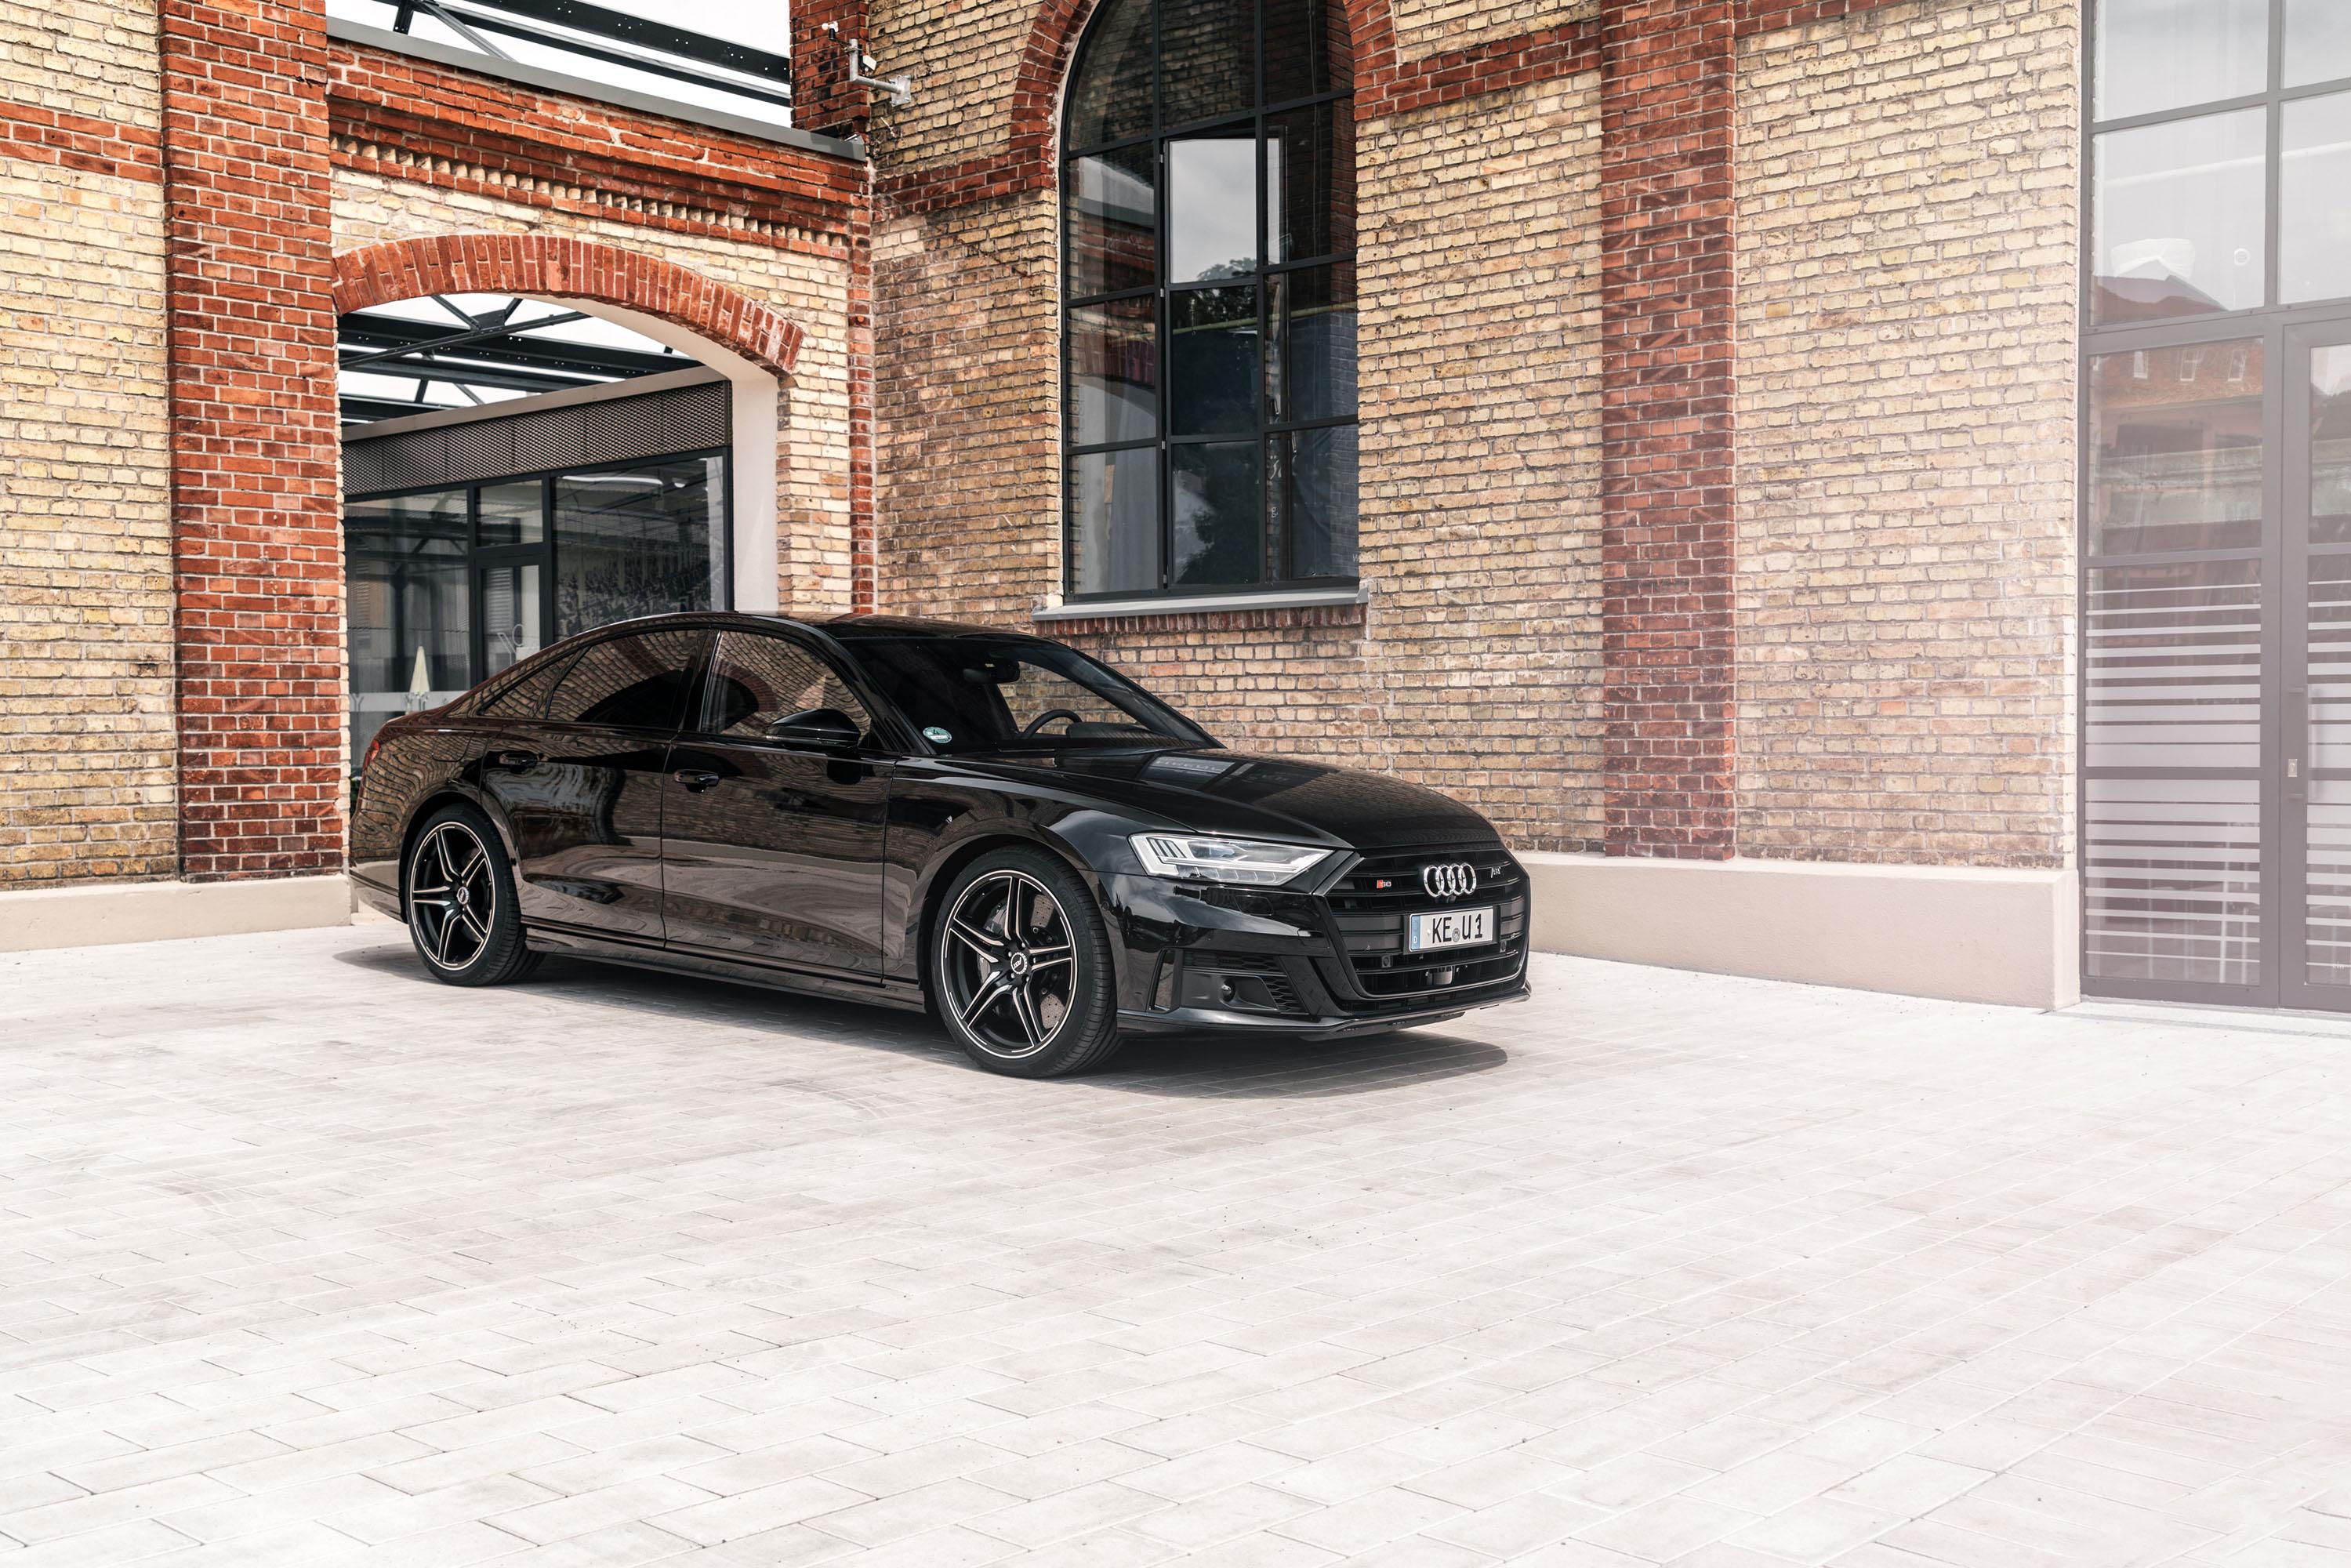 ABT Audi S8 photo #1